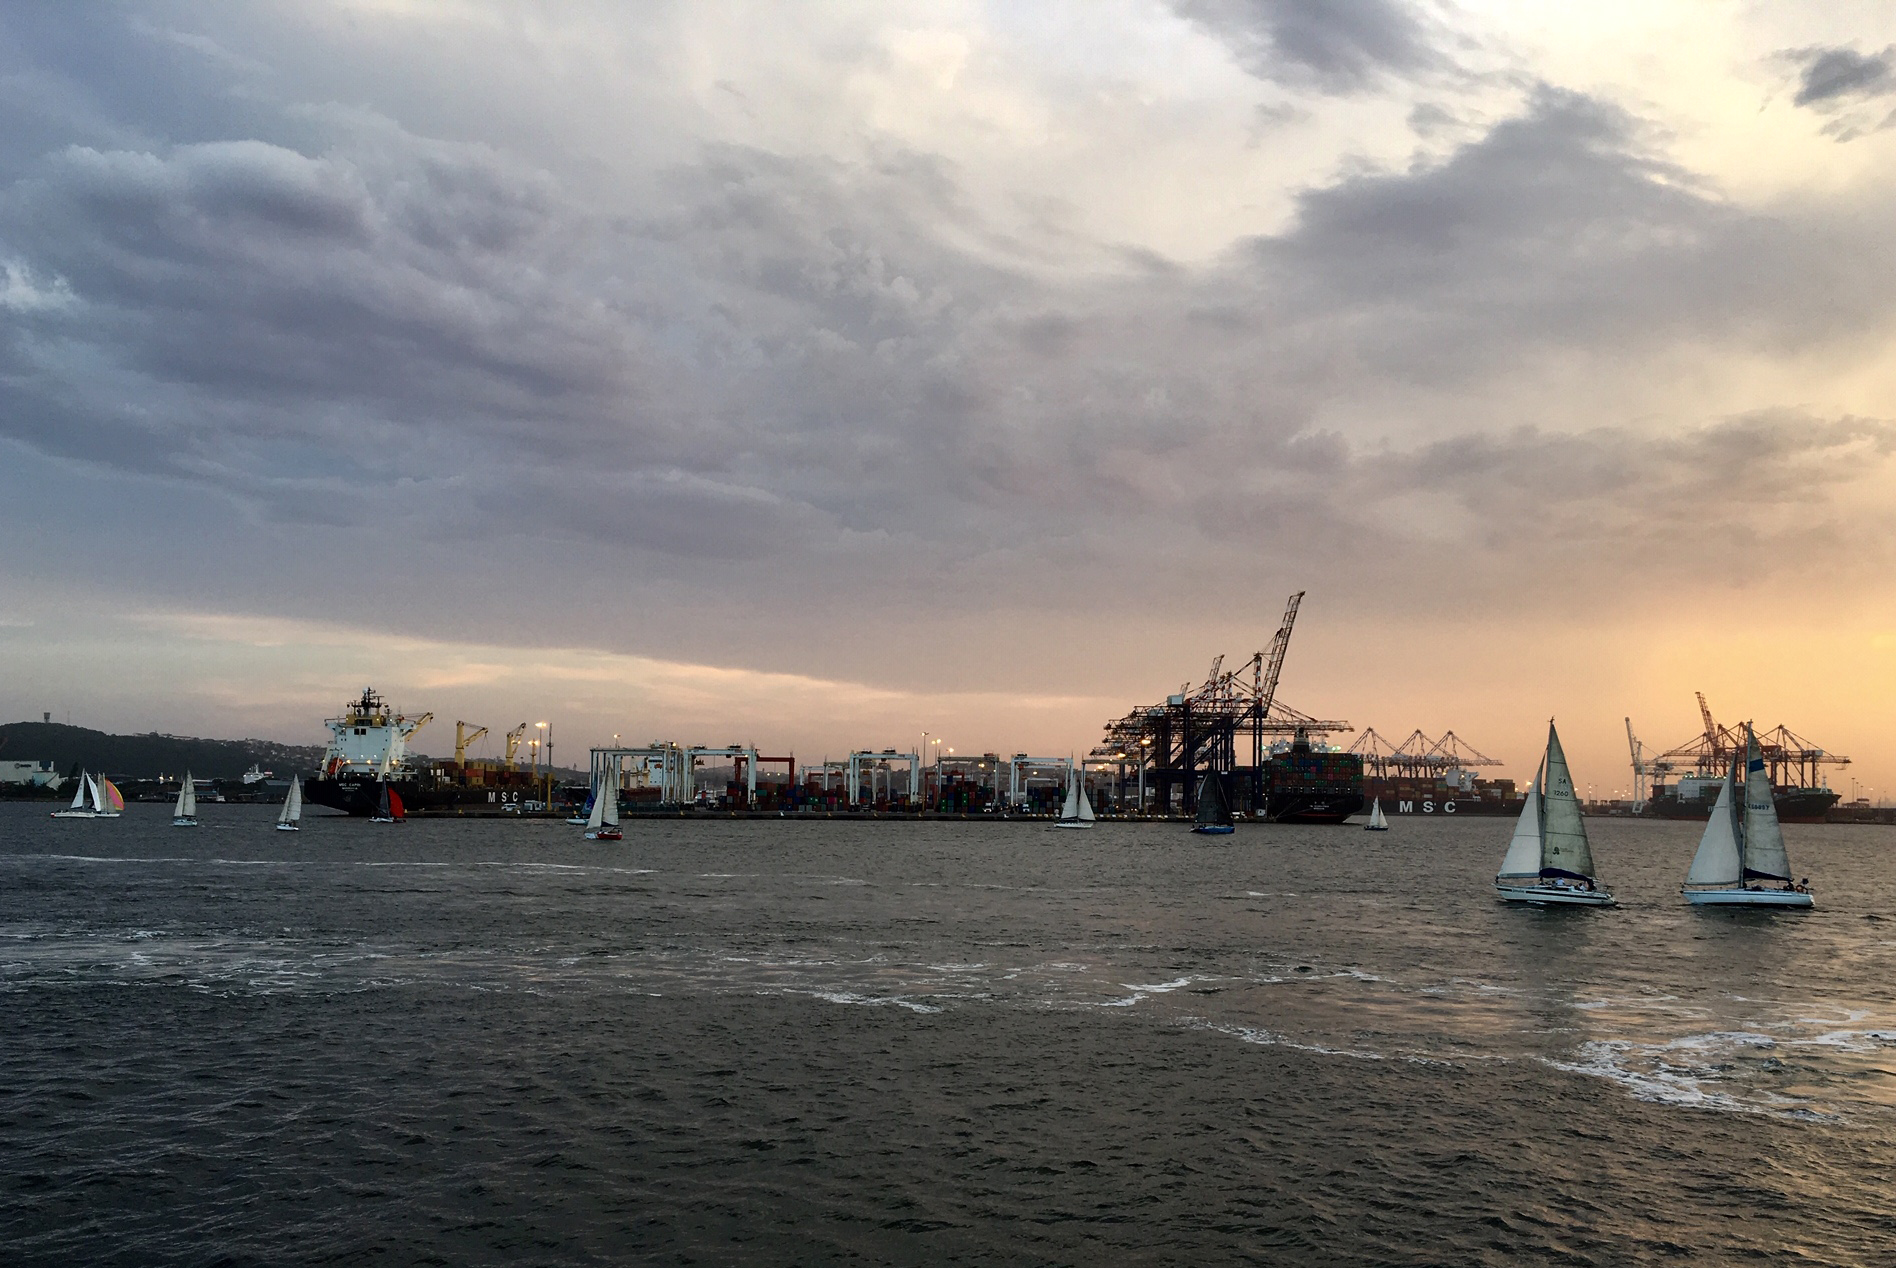 regatta in durban harbour IMG_4414.jpg